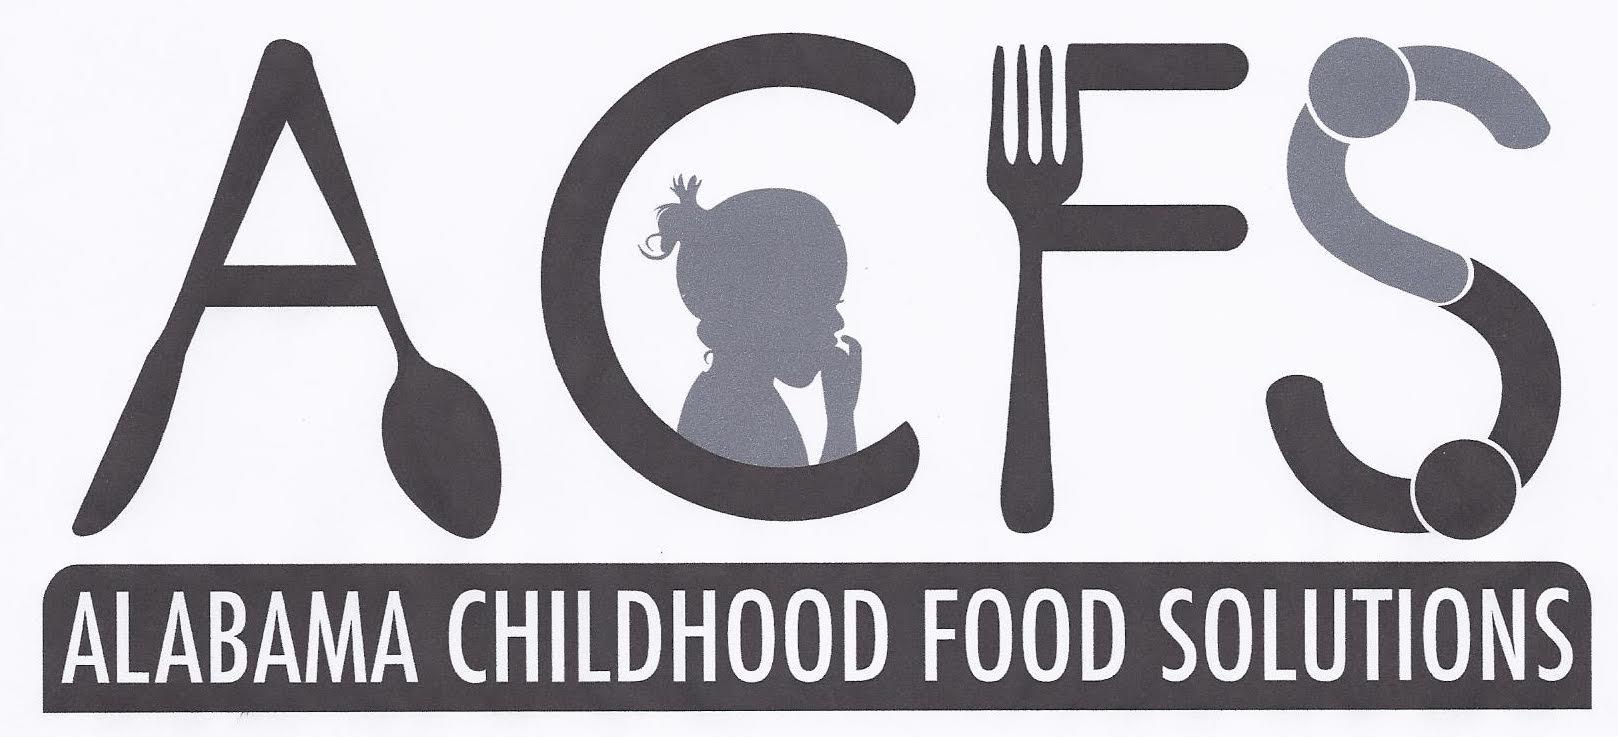 Alabama Childhood Food